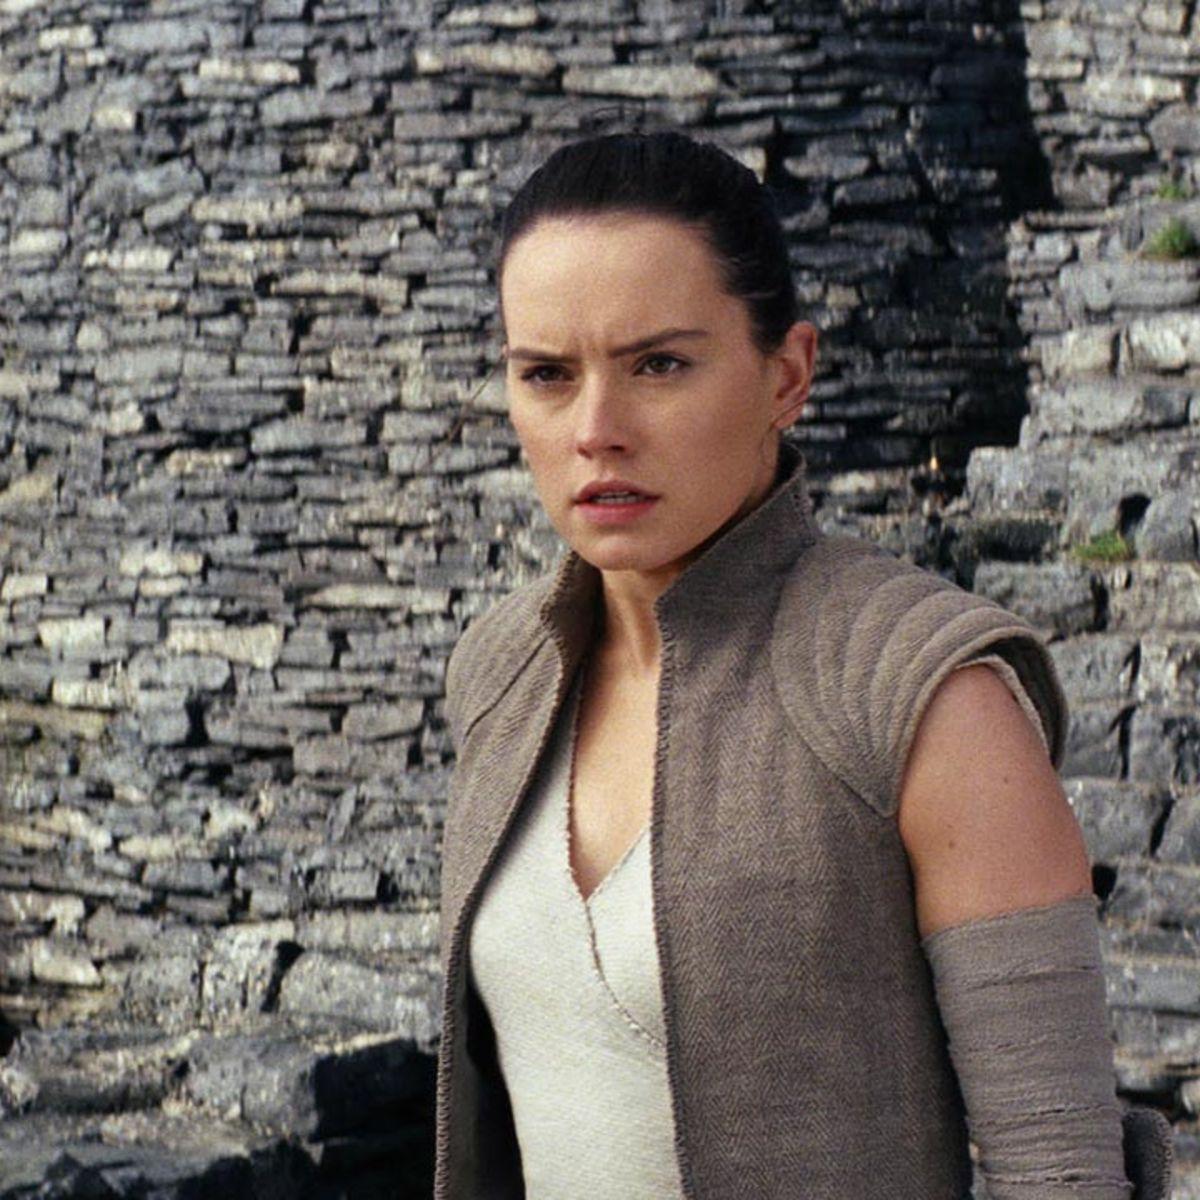 Star Wars: The Last Jedi- Daisy Ridley as Rey